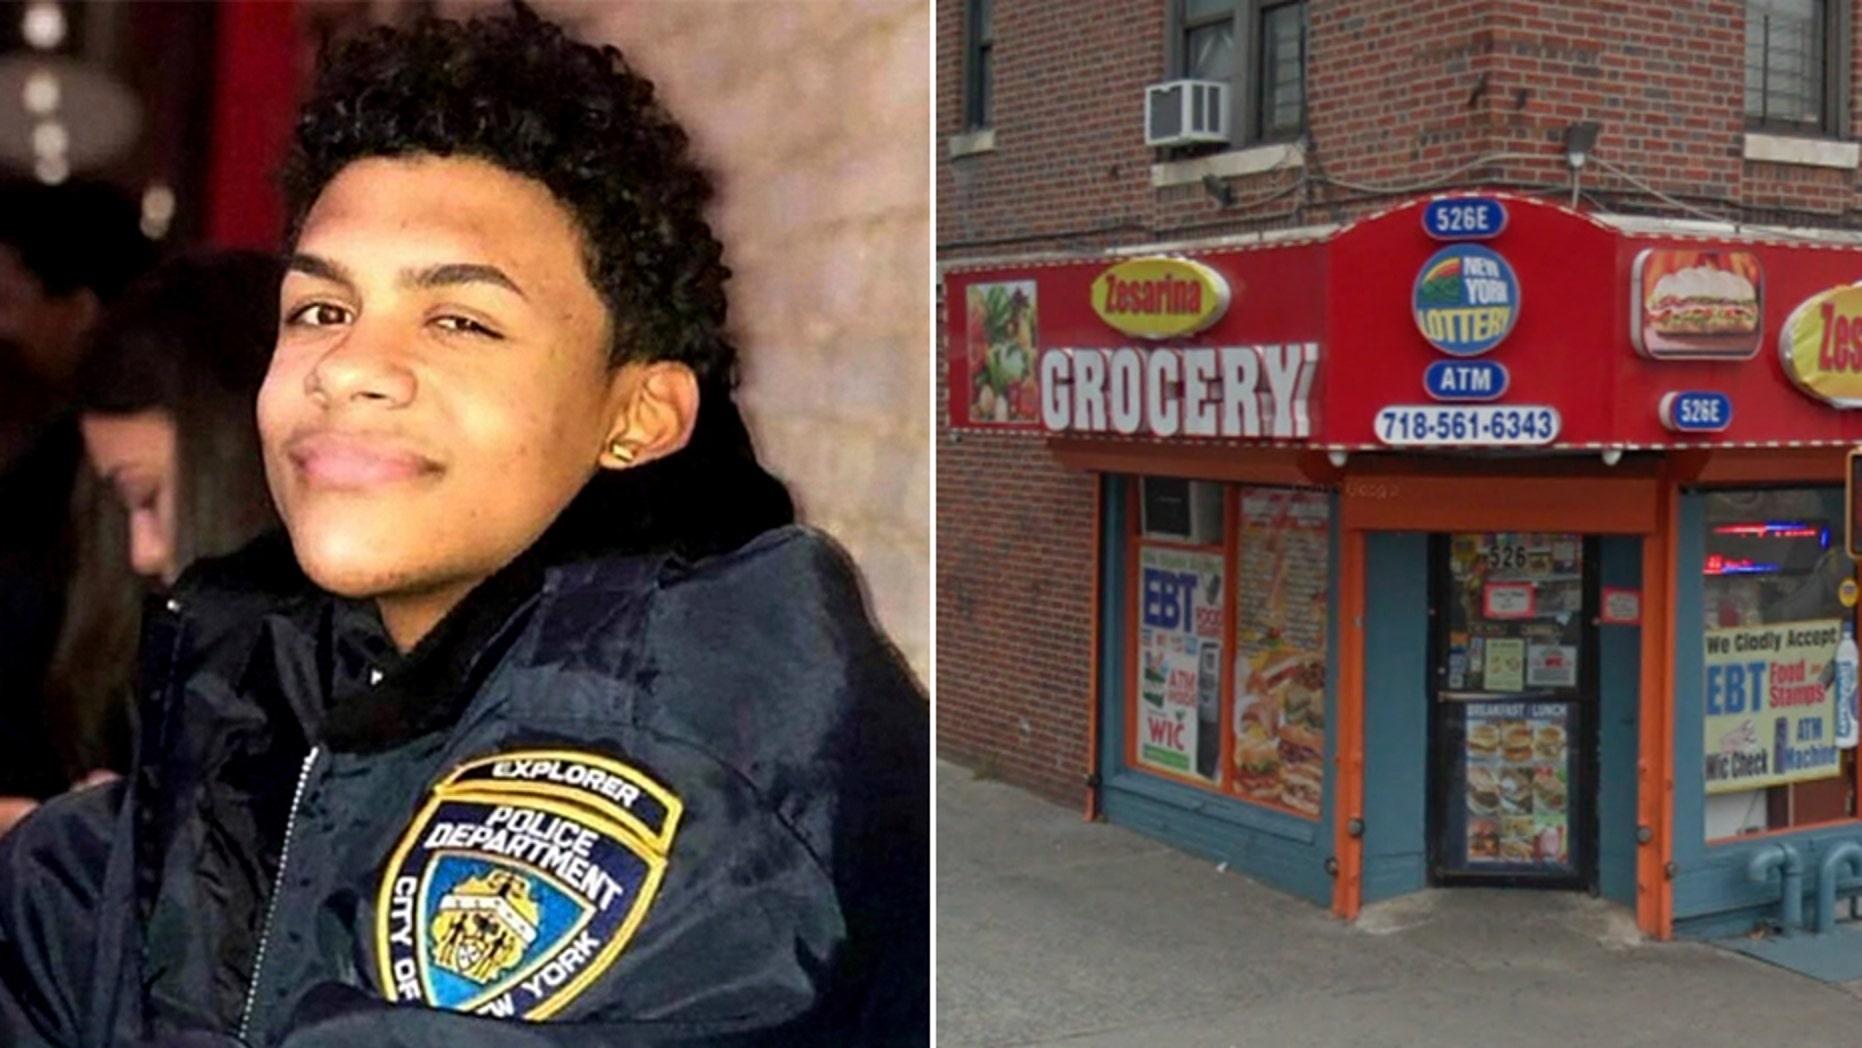 Lesandro Guzman-Feliz, 15, was stabbed outside the Zesarina Grocery store in New York City last week.